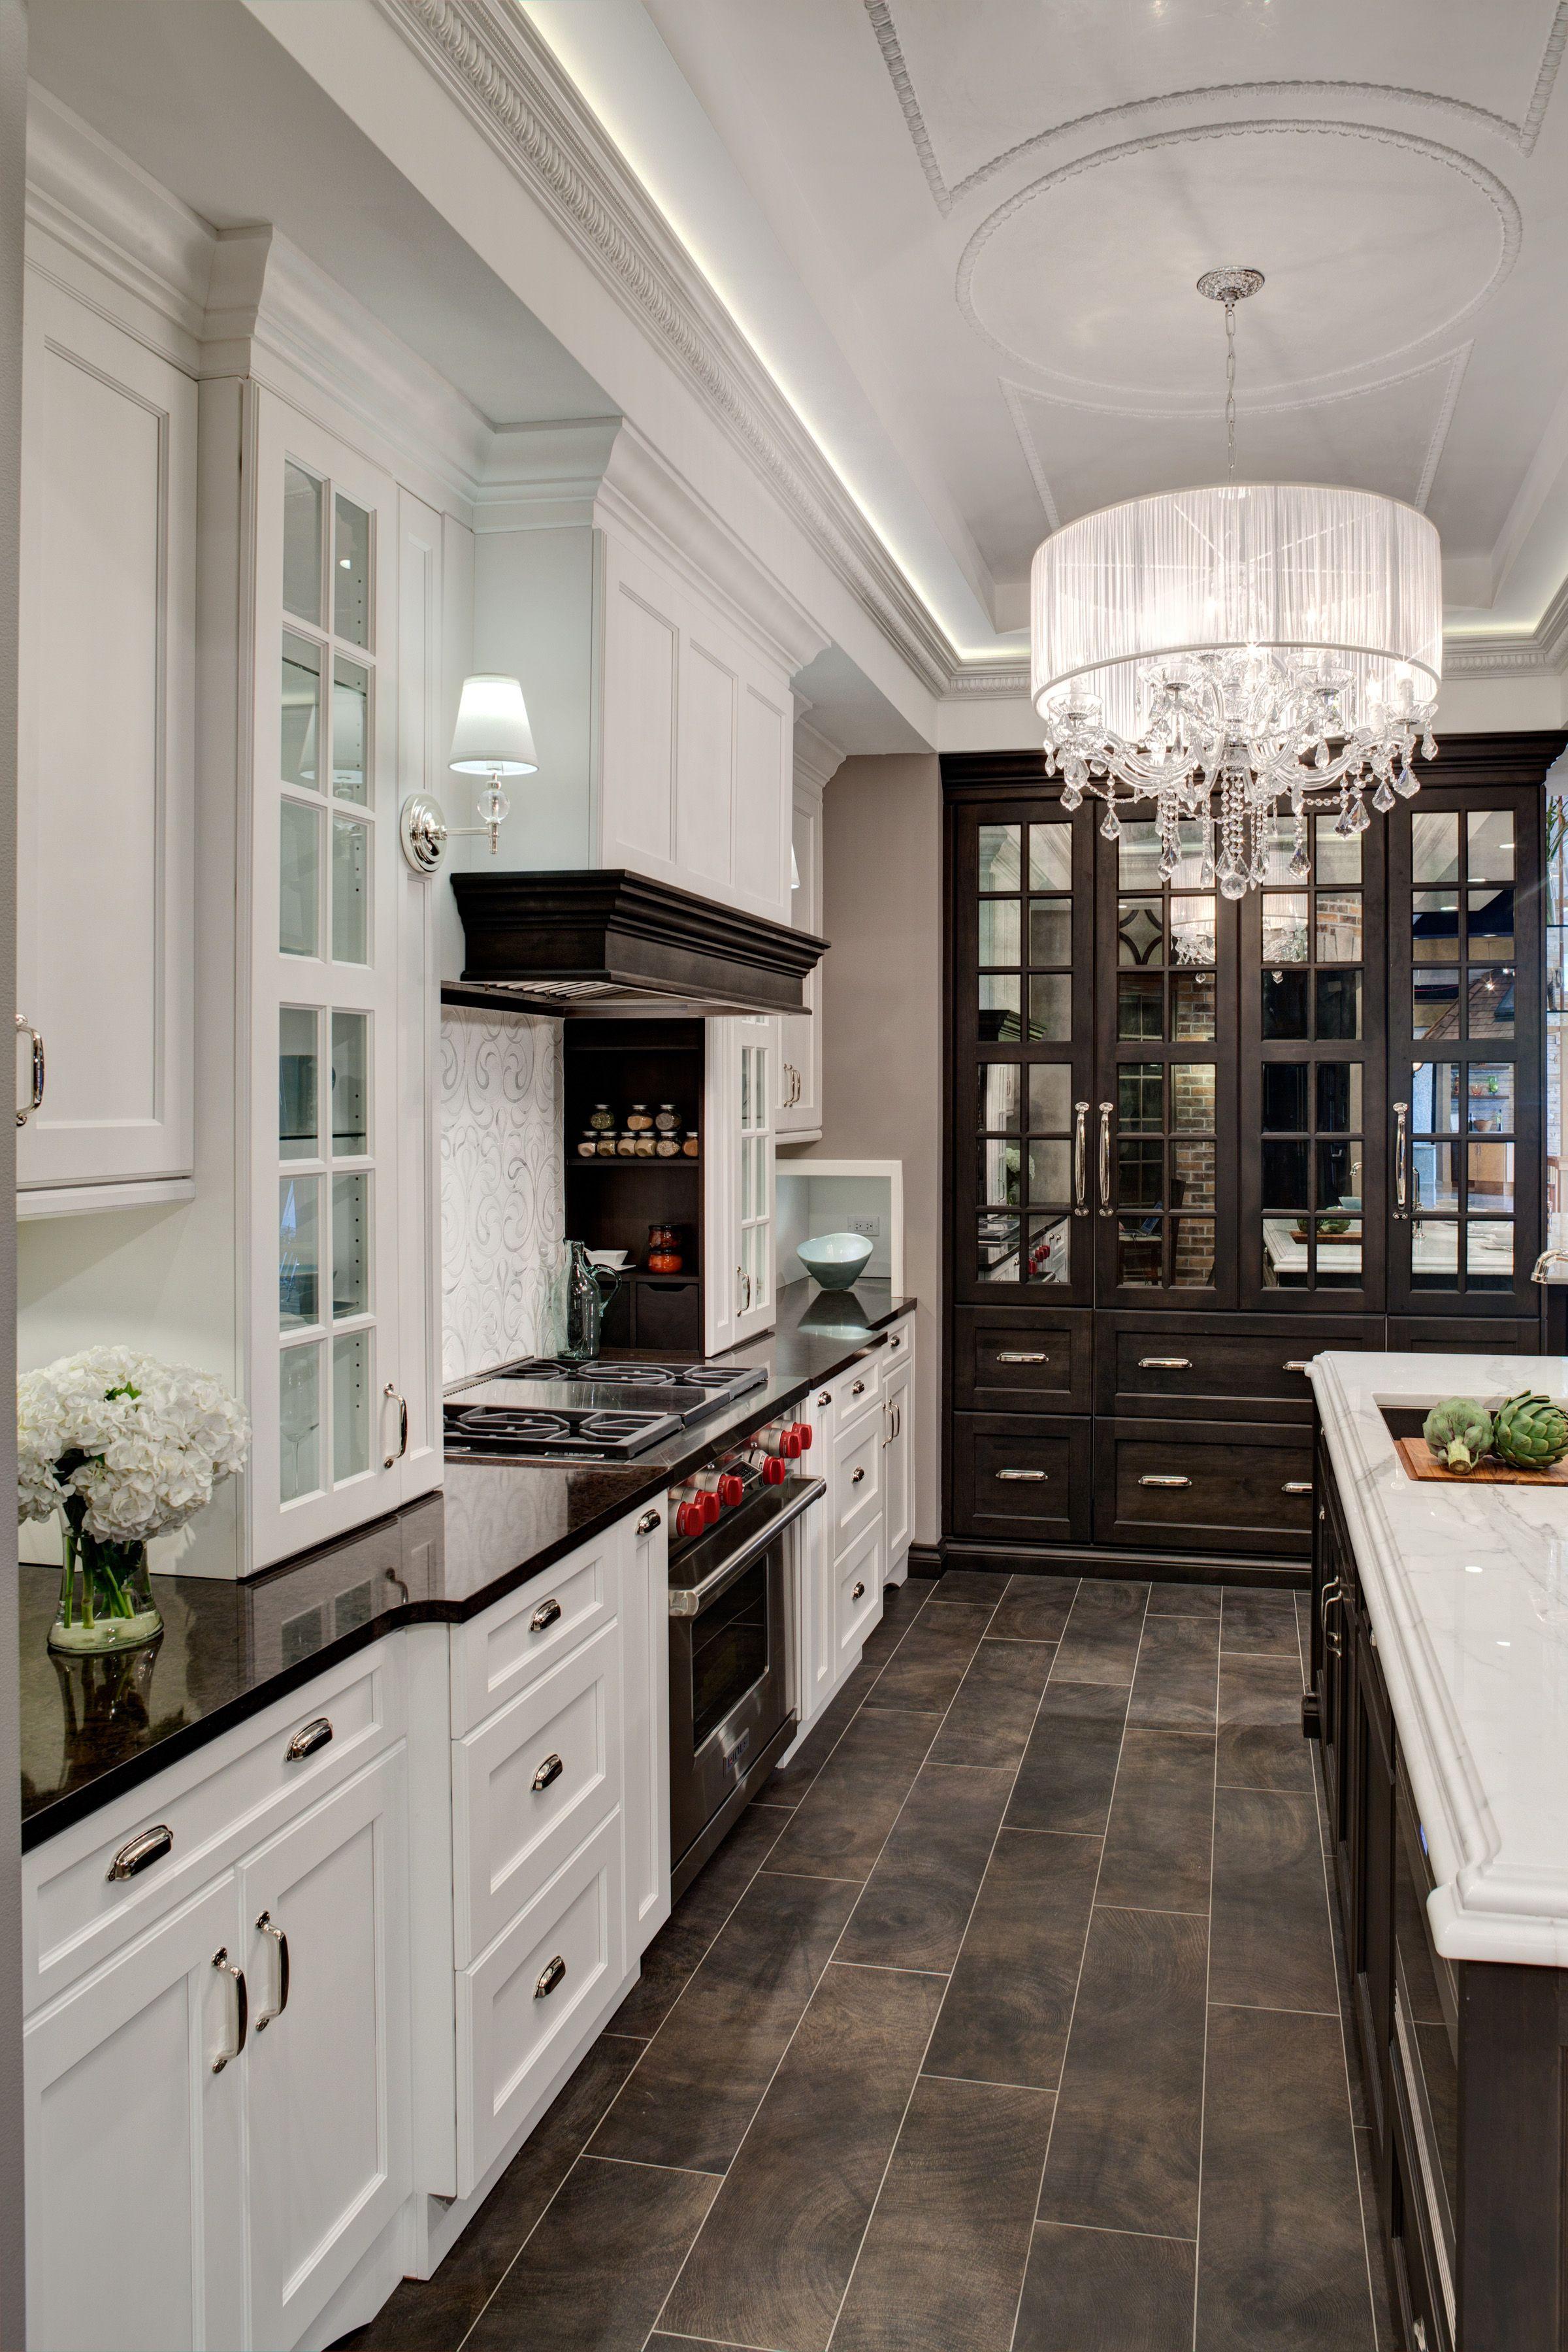 Lincolnwood design showroom kitchen display Интерьер кухня